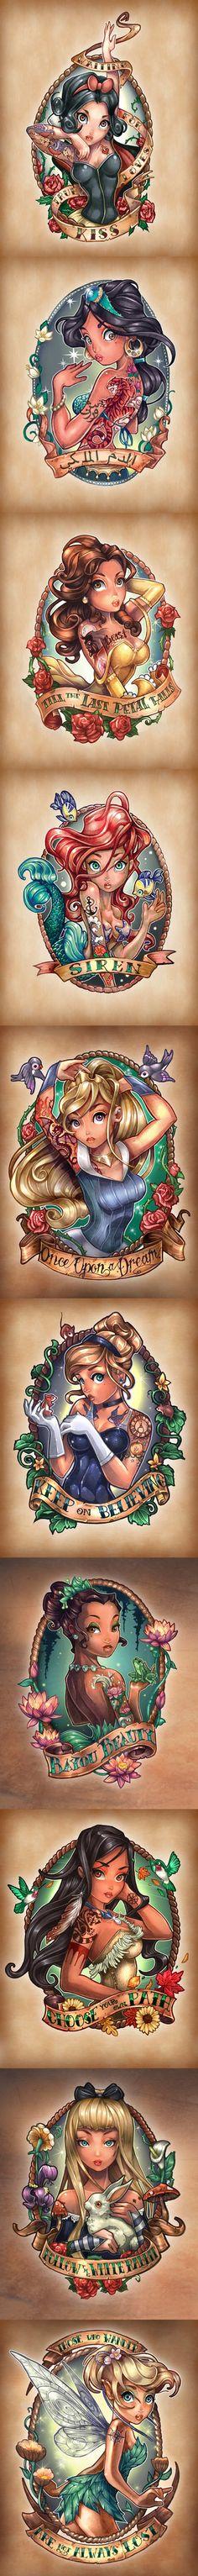 Disney Princesses as Tattooed Pinup Girls! ( + Alice and Tinkerbell ) 8 Disney Princesses as Tattooed Pinup Girls! ( + Alice and Tinkerbell Disney Princesses as Tattooed Pinup Girls! ( + Alice and Tinkerbell ) Disney Pin Up, Disney Art, Disney Girls, Alice Disney, Funny Disney, Disney Tattoos, Tattoo Und Piercing, Princesa Disney, Trendy Tattoos